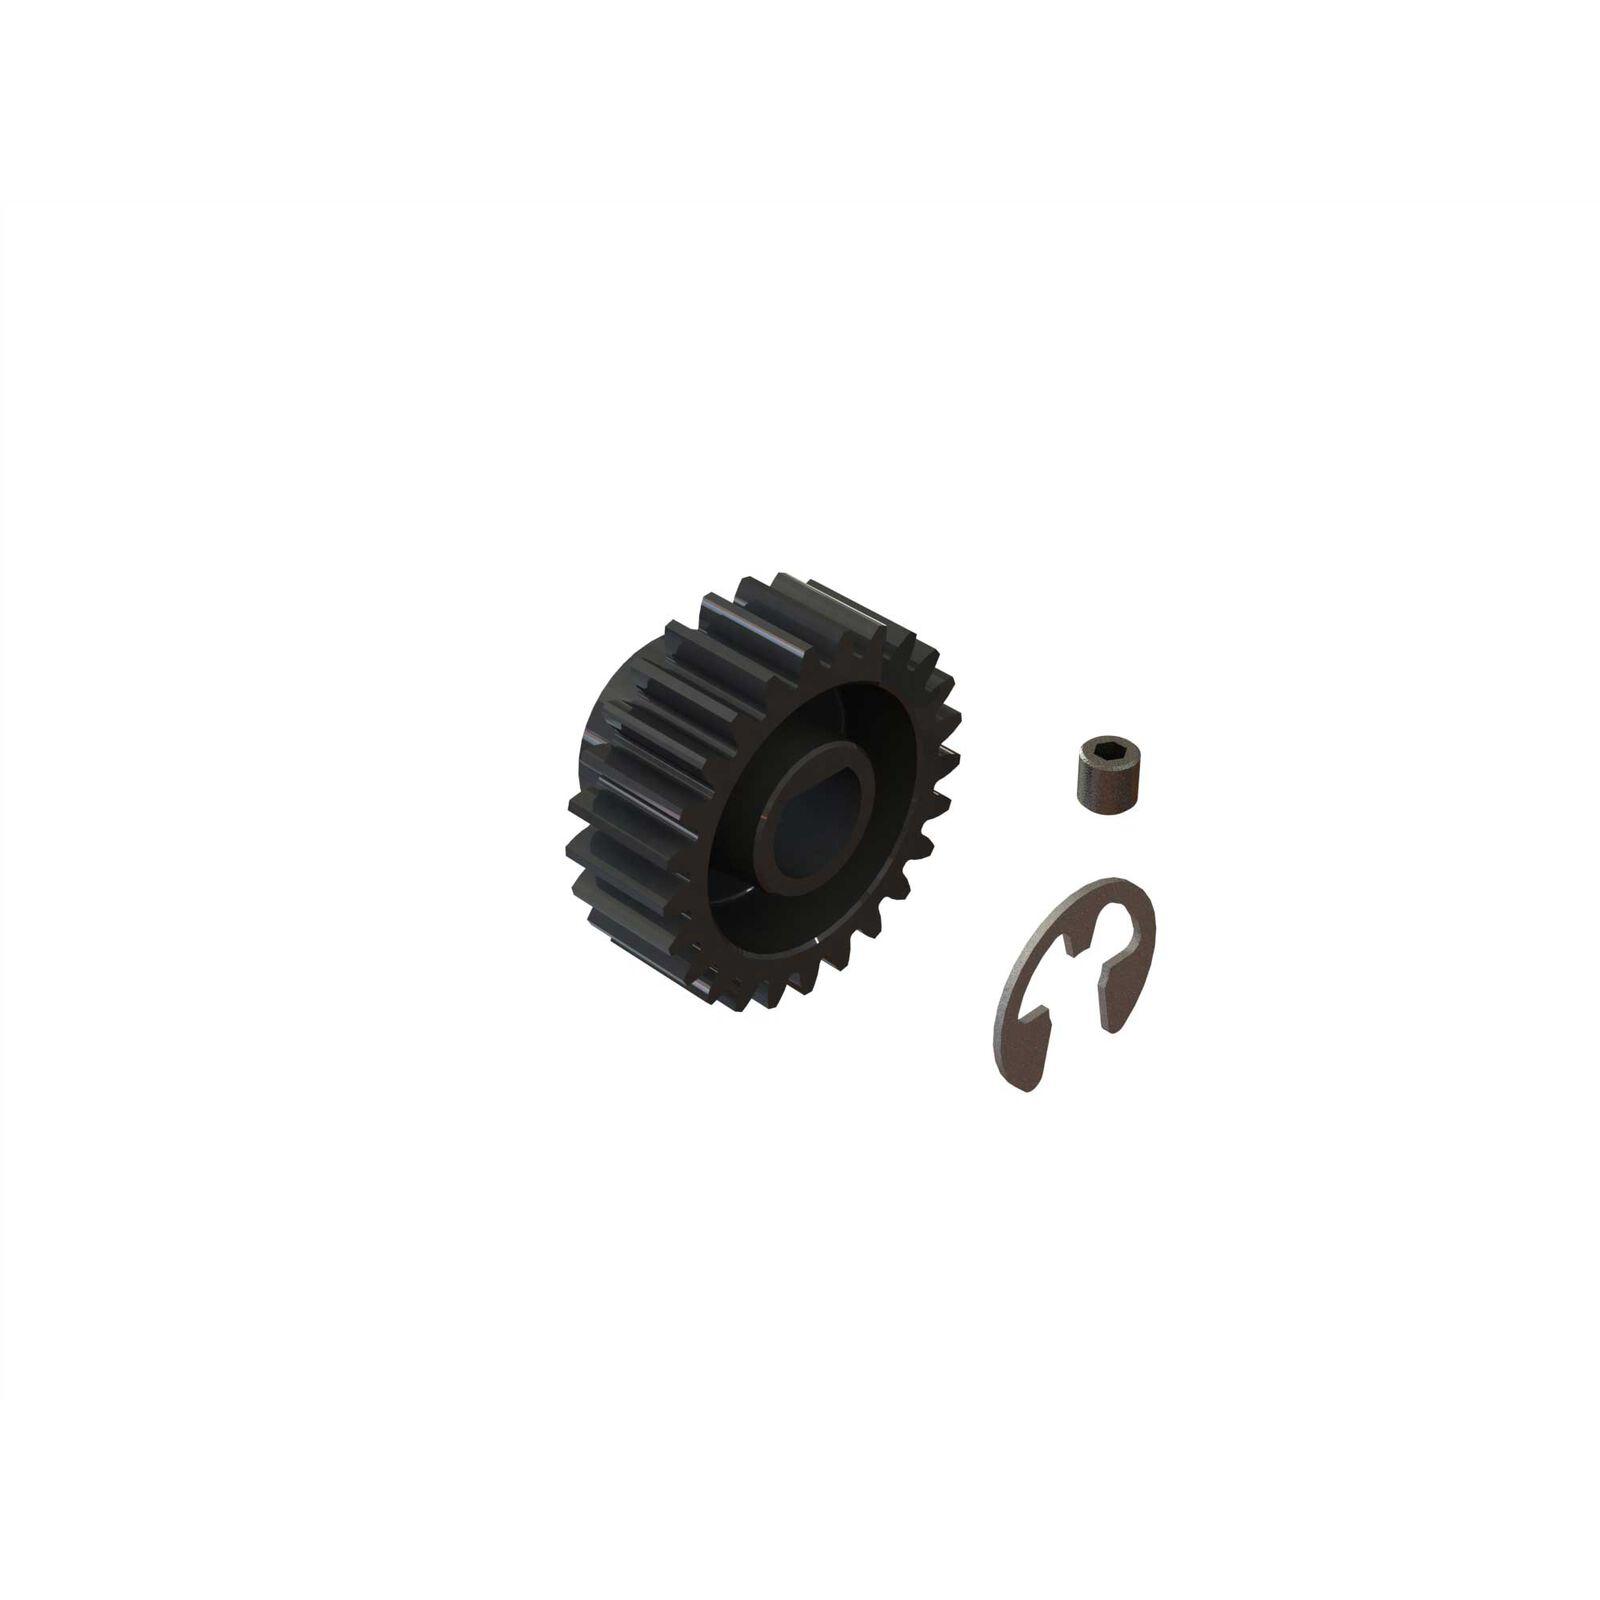 25T Mod1 Safe-D8 Pinion Gear